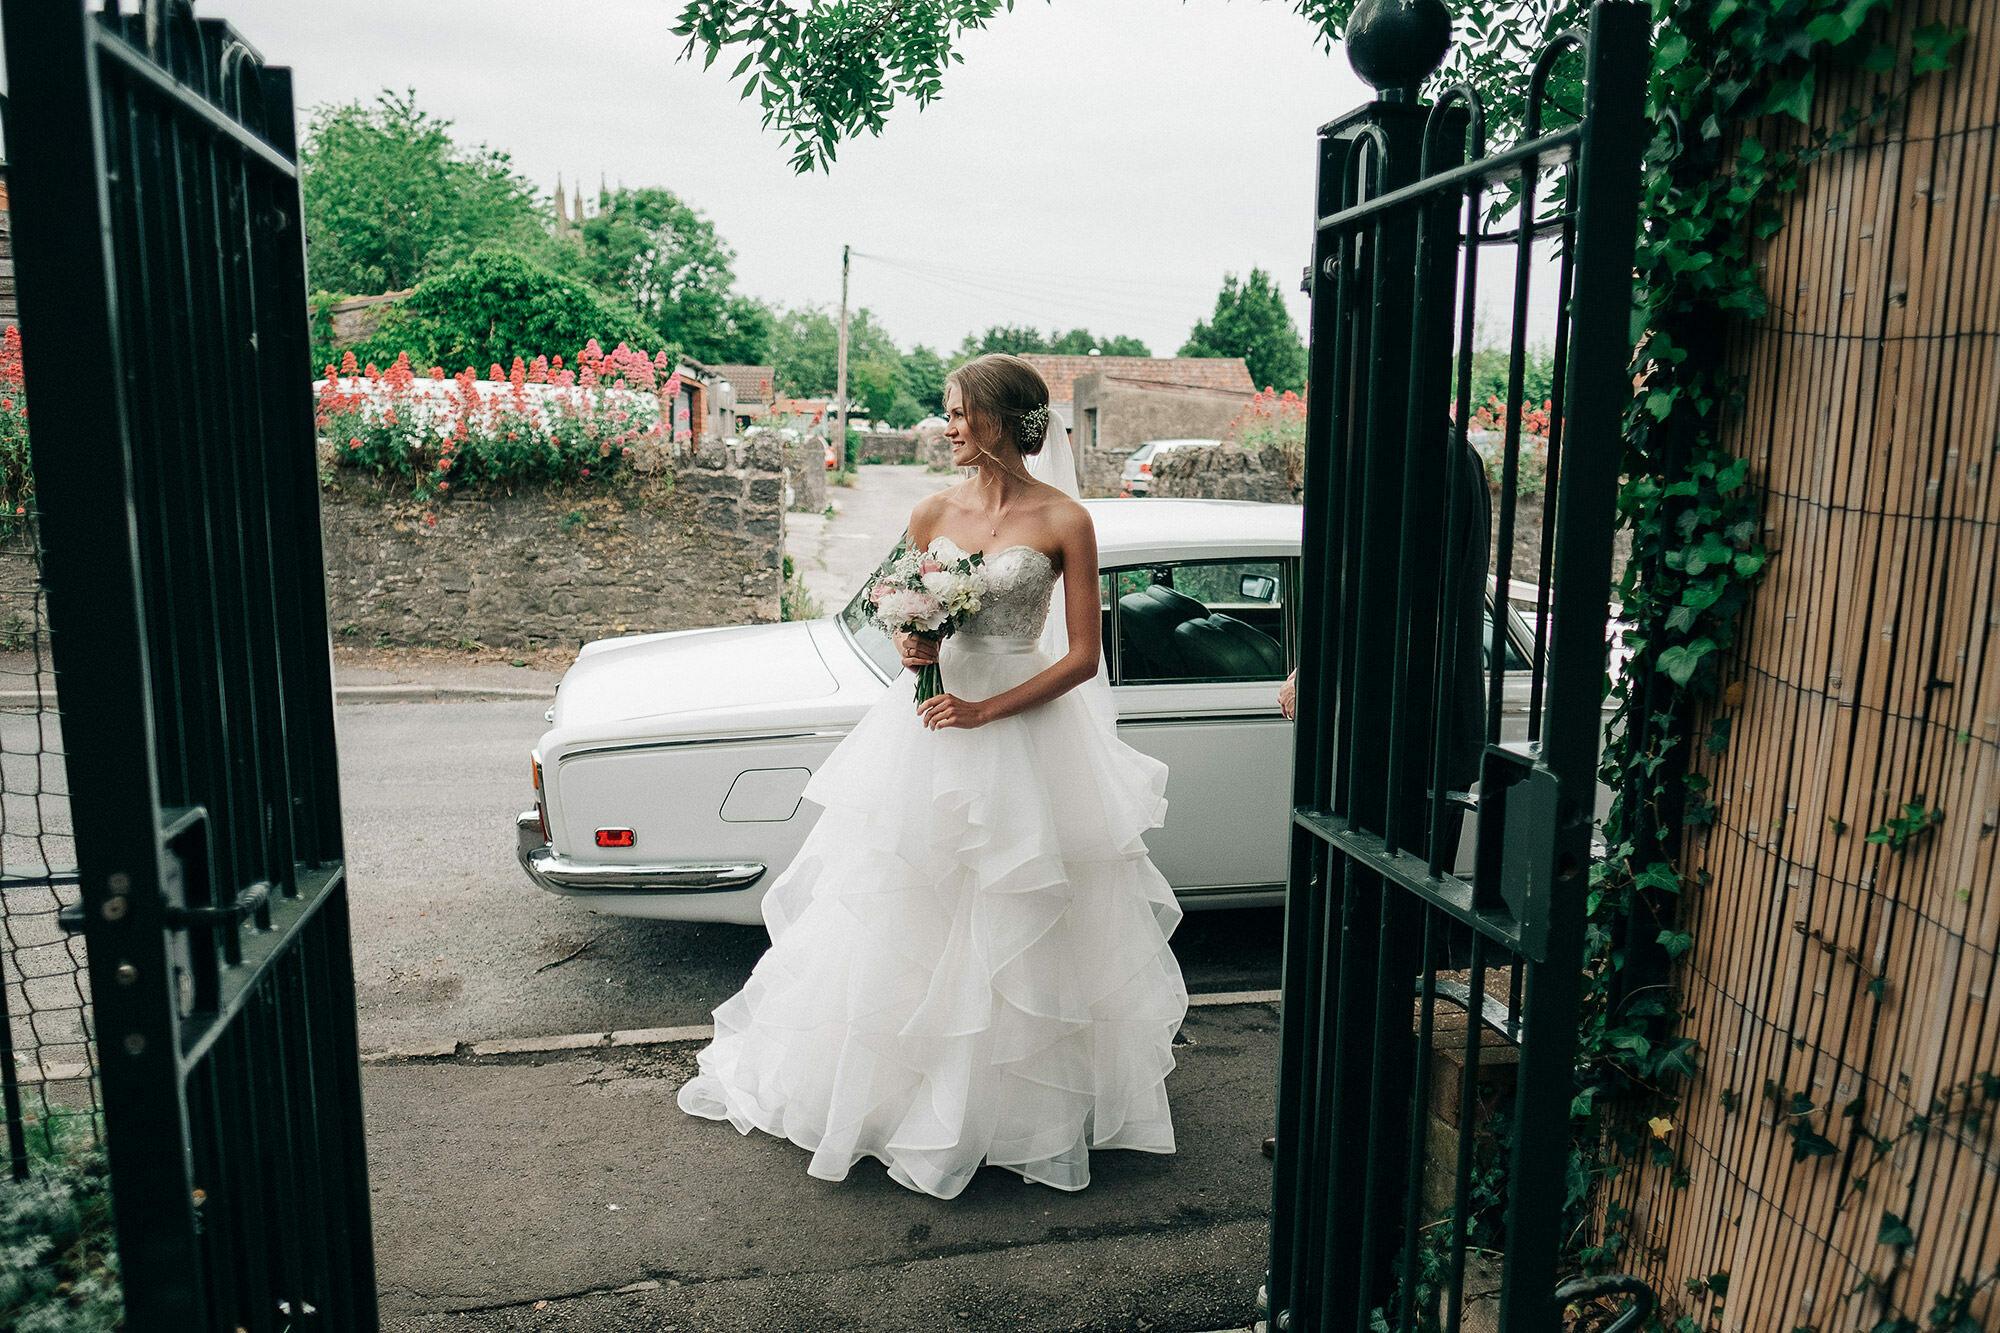 taisy-matthew-wed-2016-0229